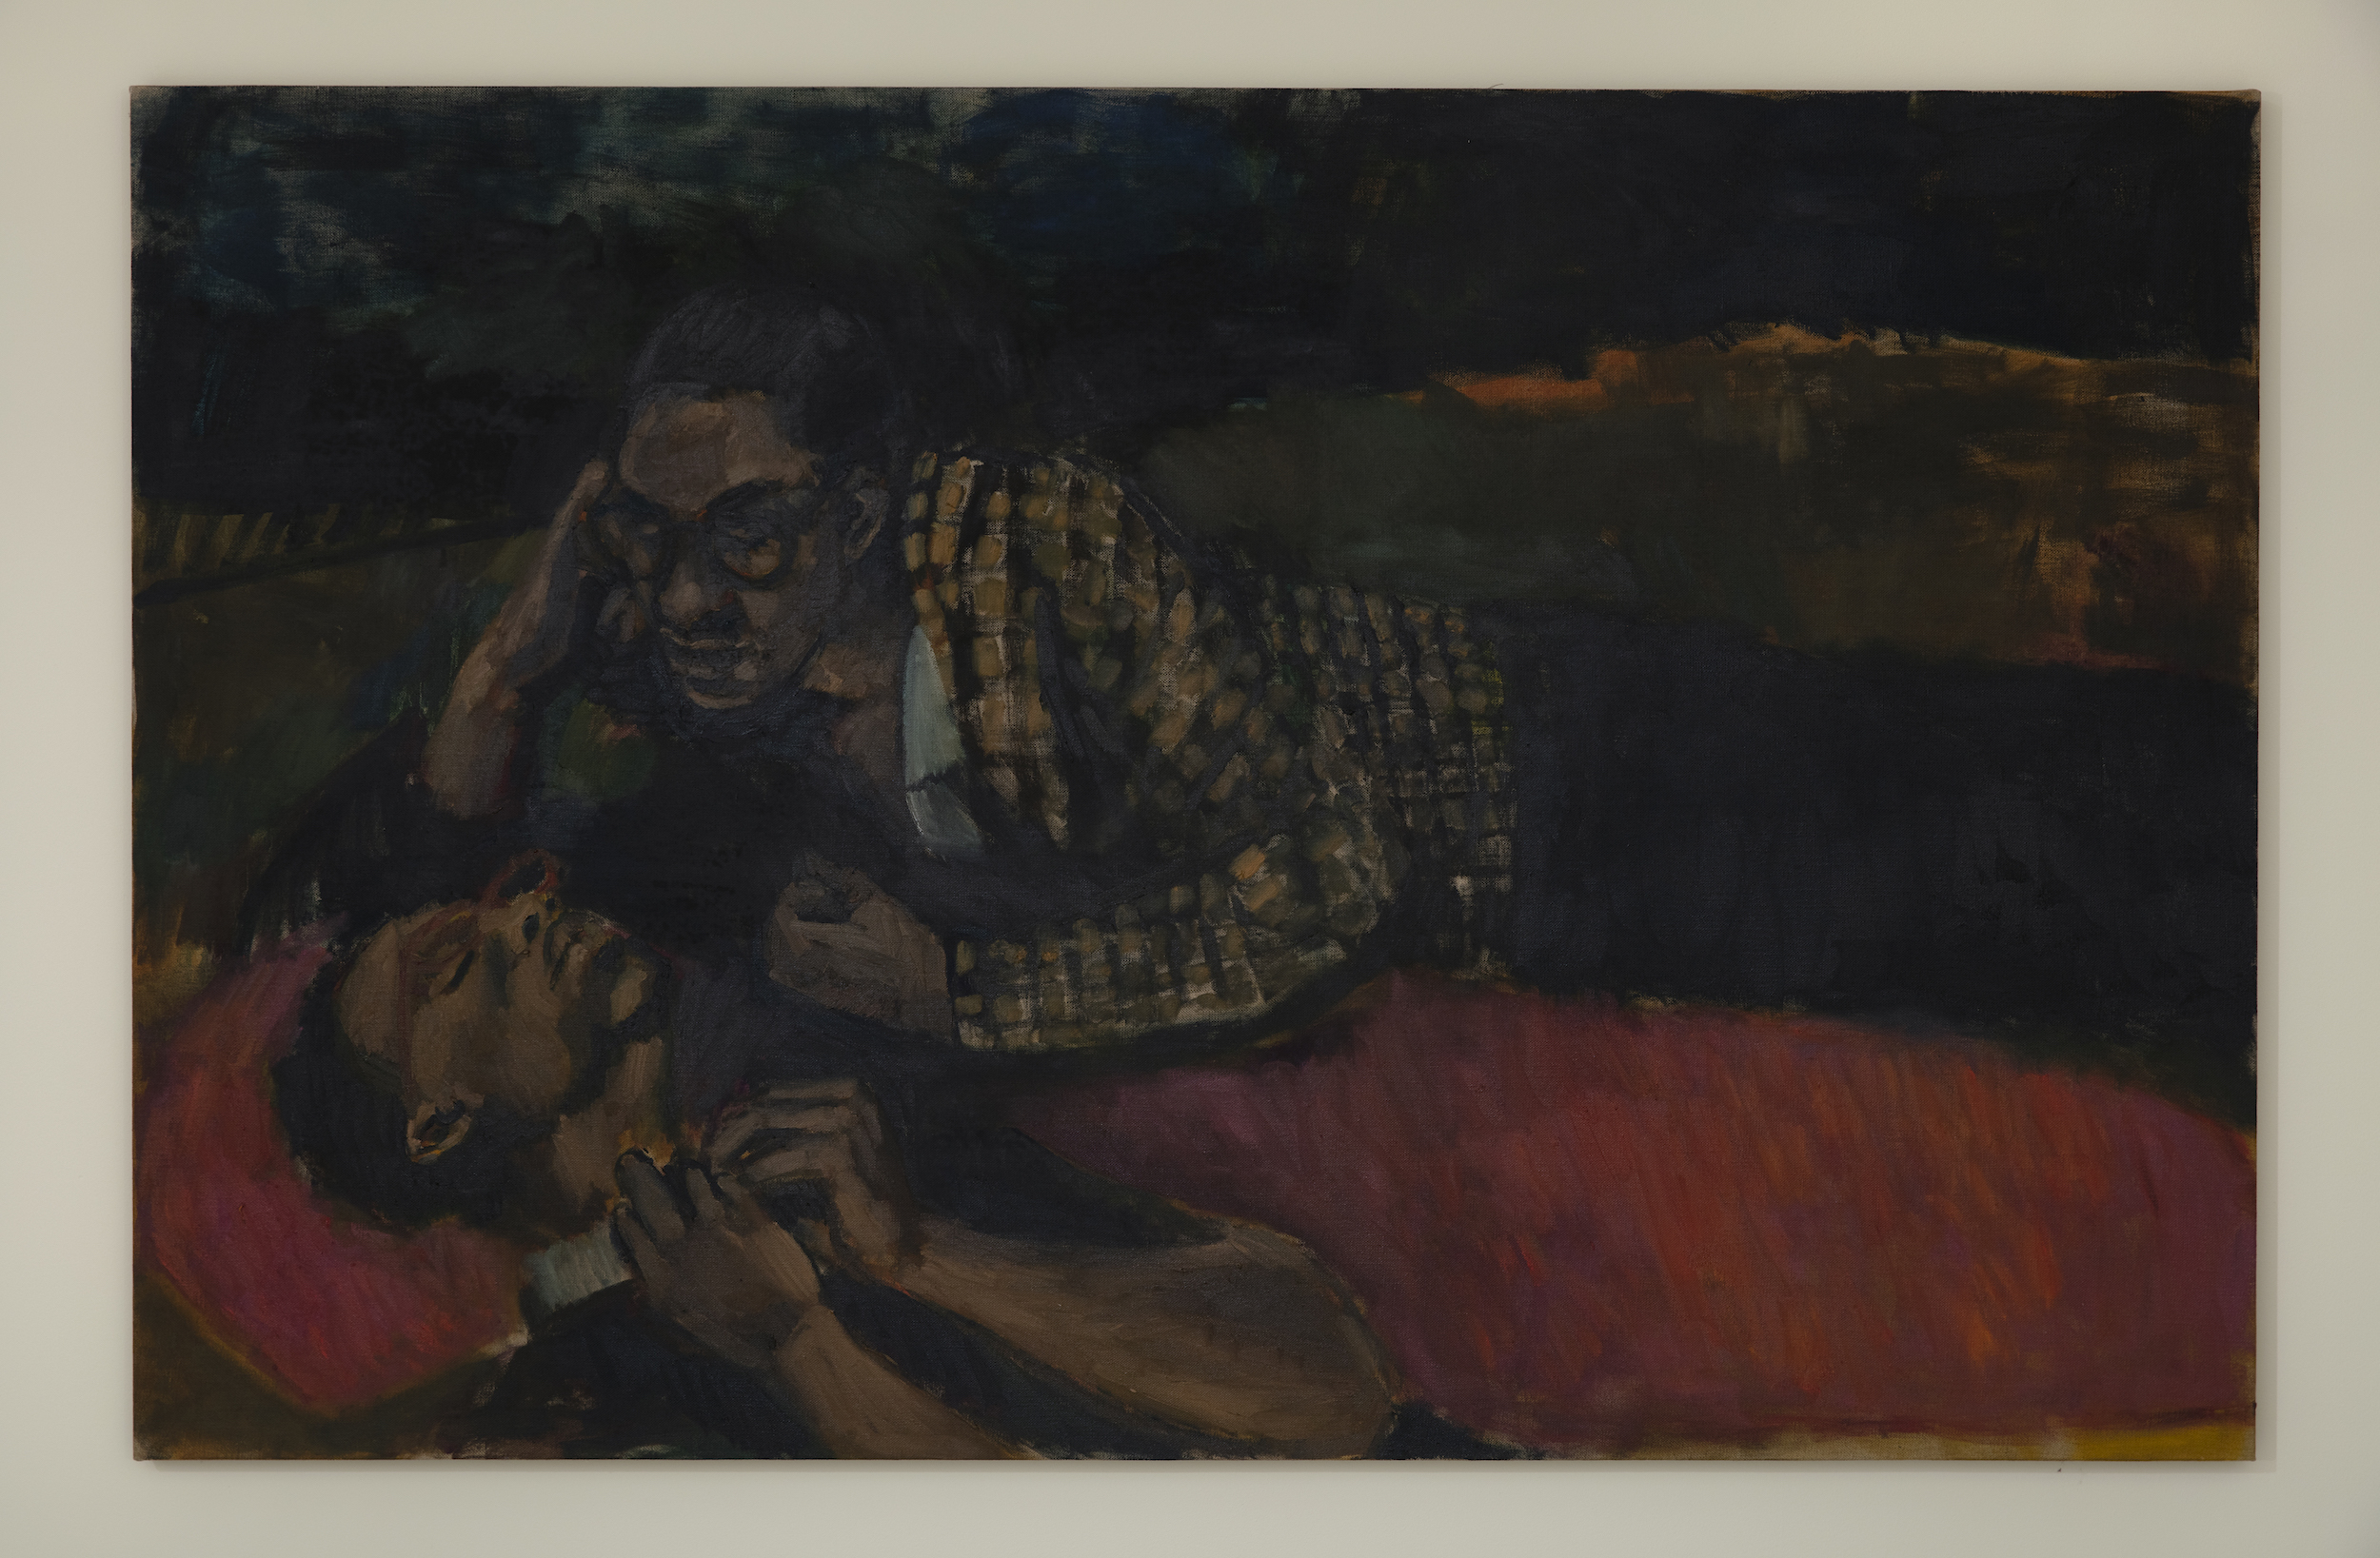 Lynette Yiadom-Boakye, Holy Provocations, 2018. © Lynette Yiadom-Boakye. Courtesy of the artist, Jack Shainman Gallery, New York and Corvi-Mora, London.